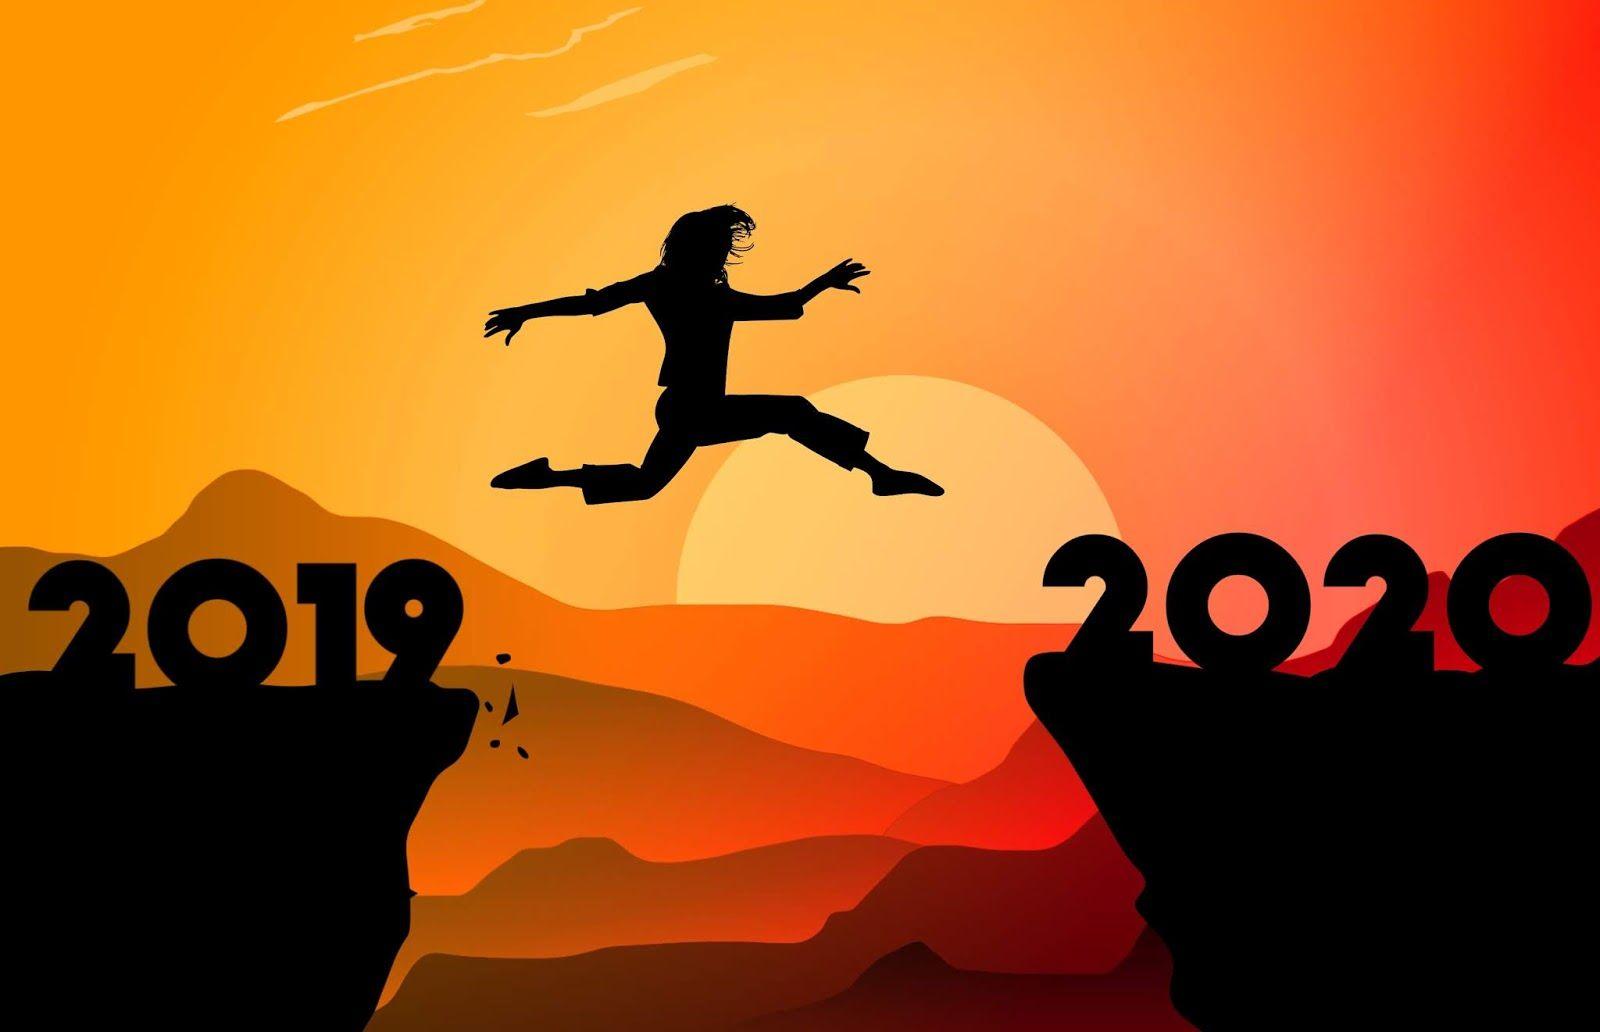 illustrations of reaching new year 2020 Bilder neujahr